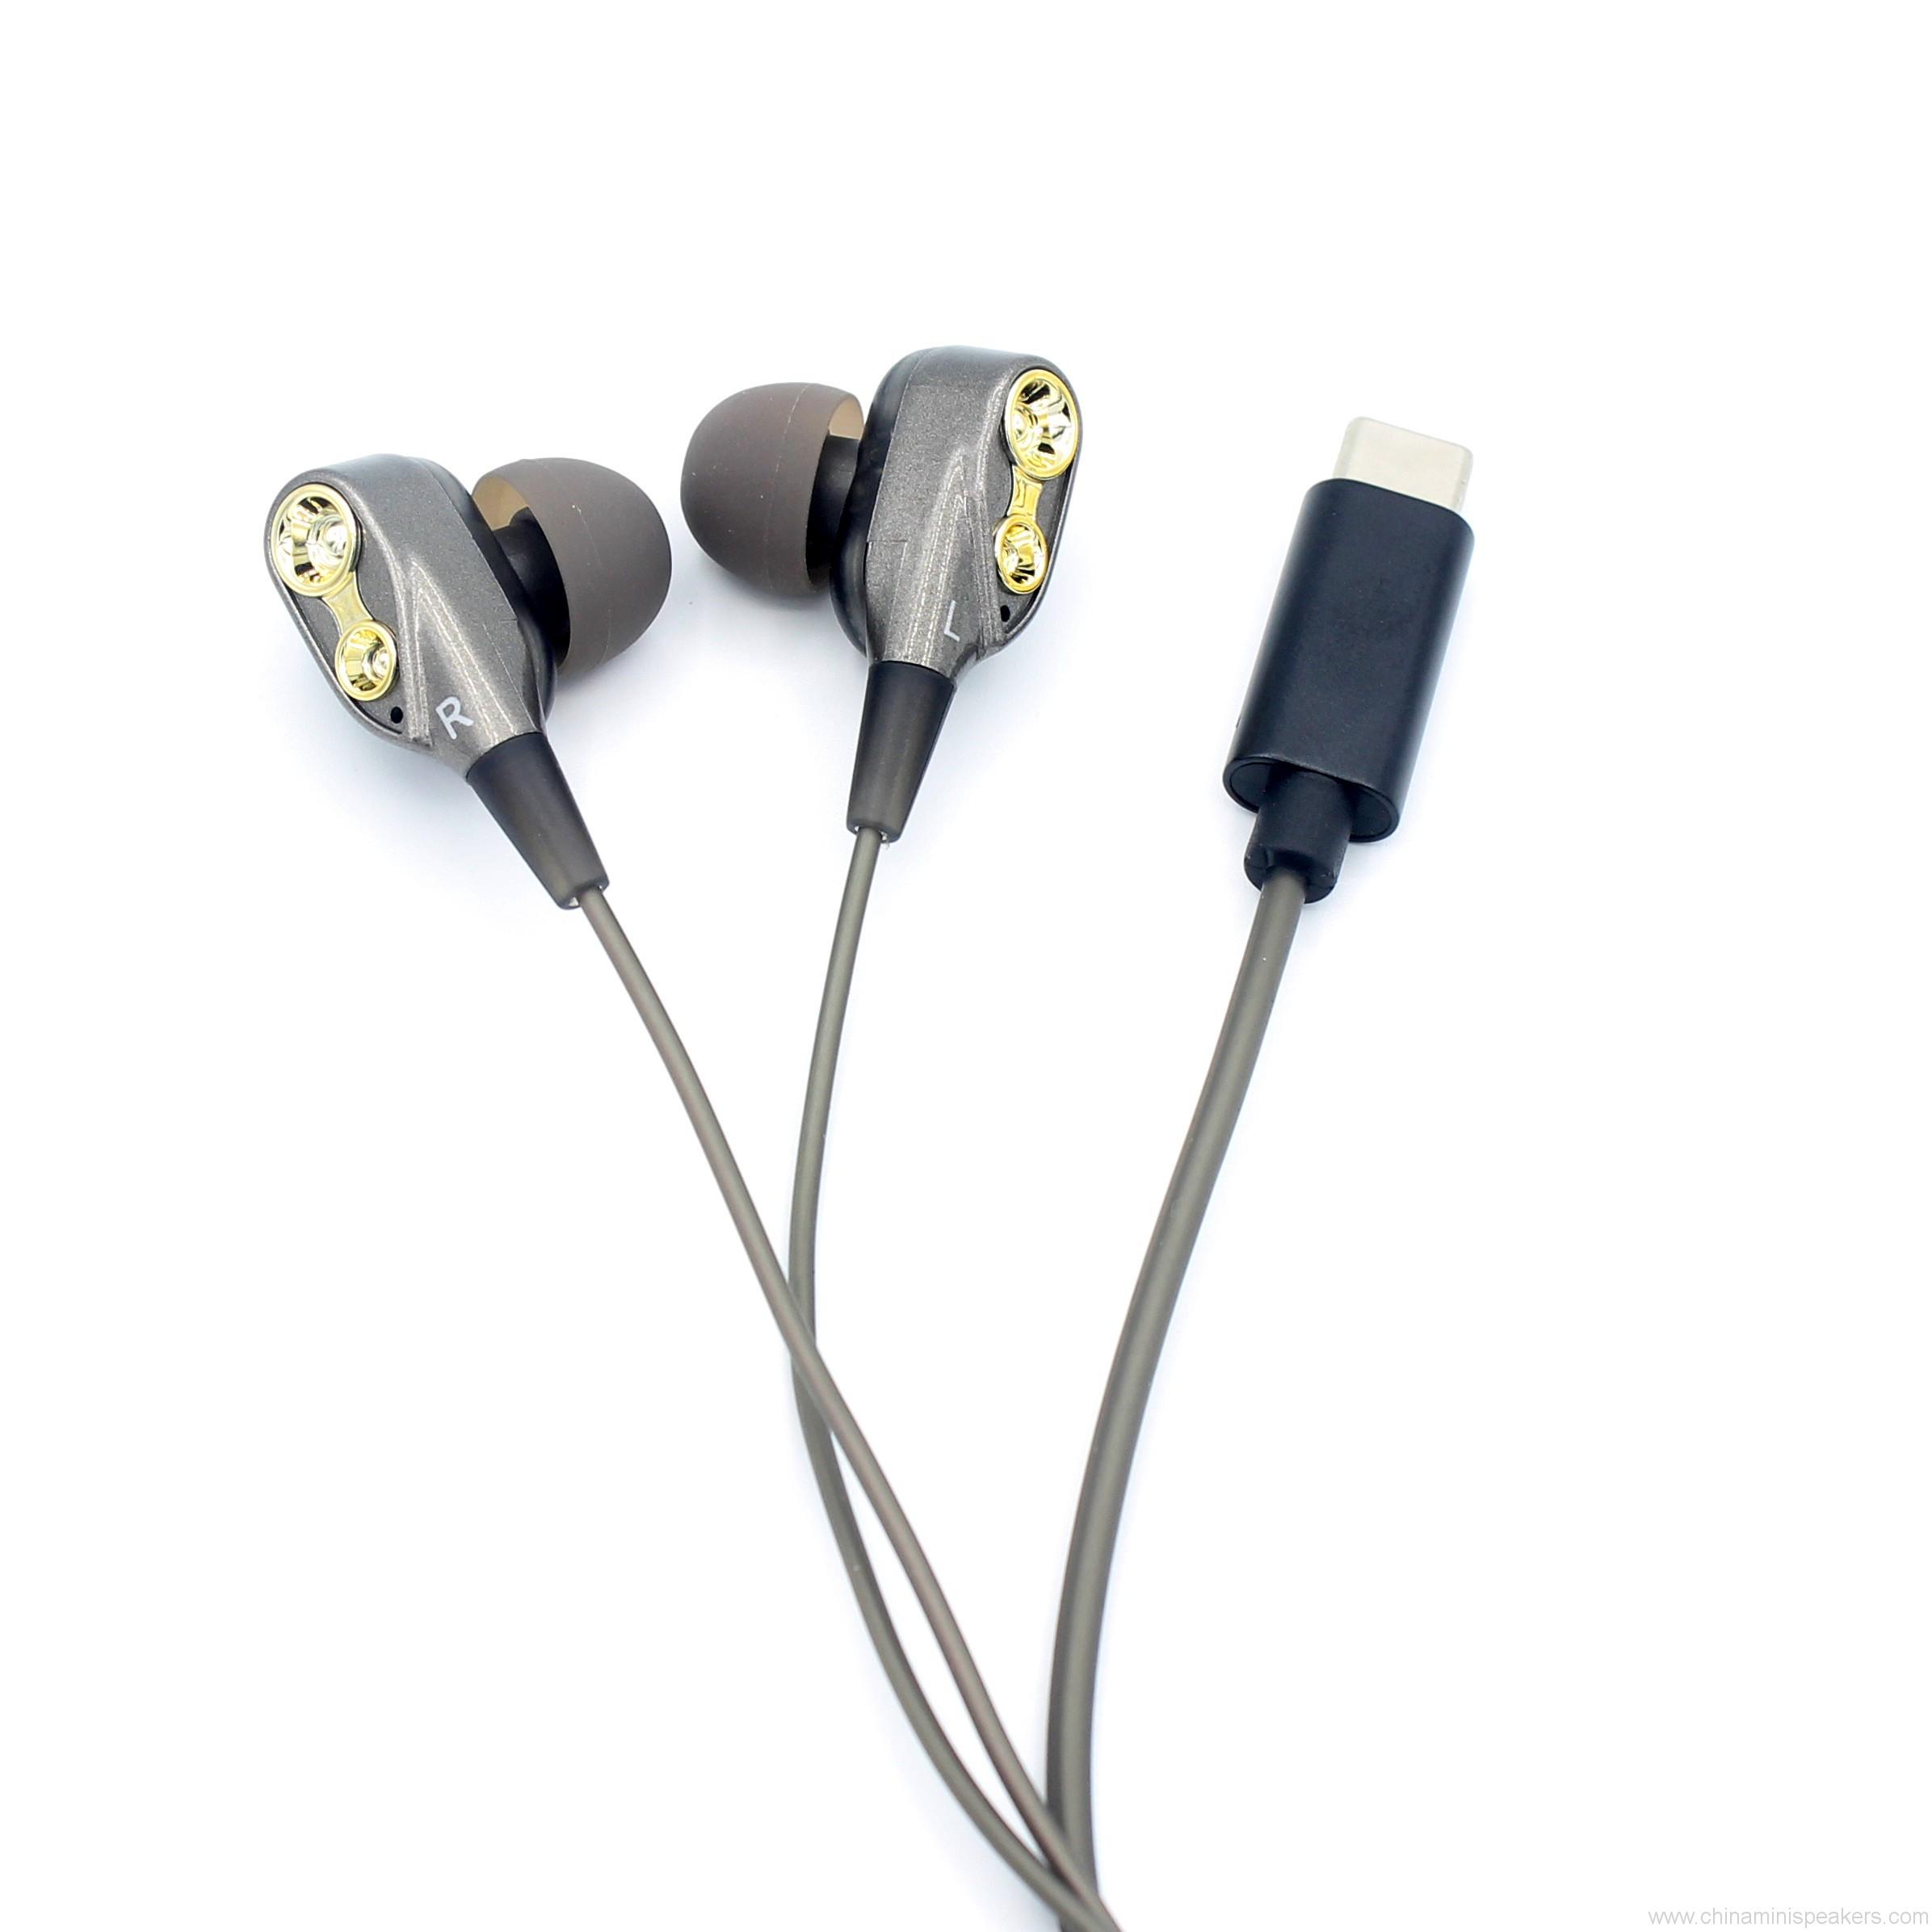 Bluetooth earbud volume control - bluetooth earbud mini iphone